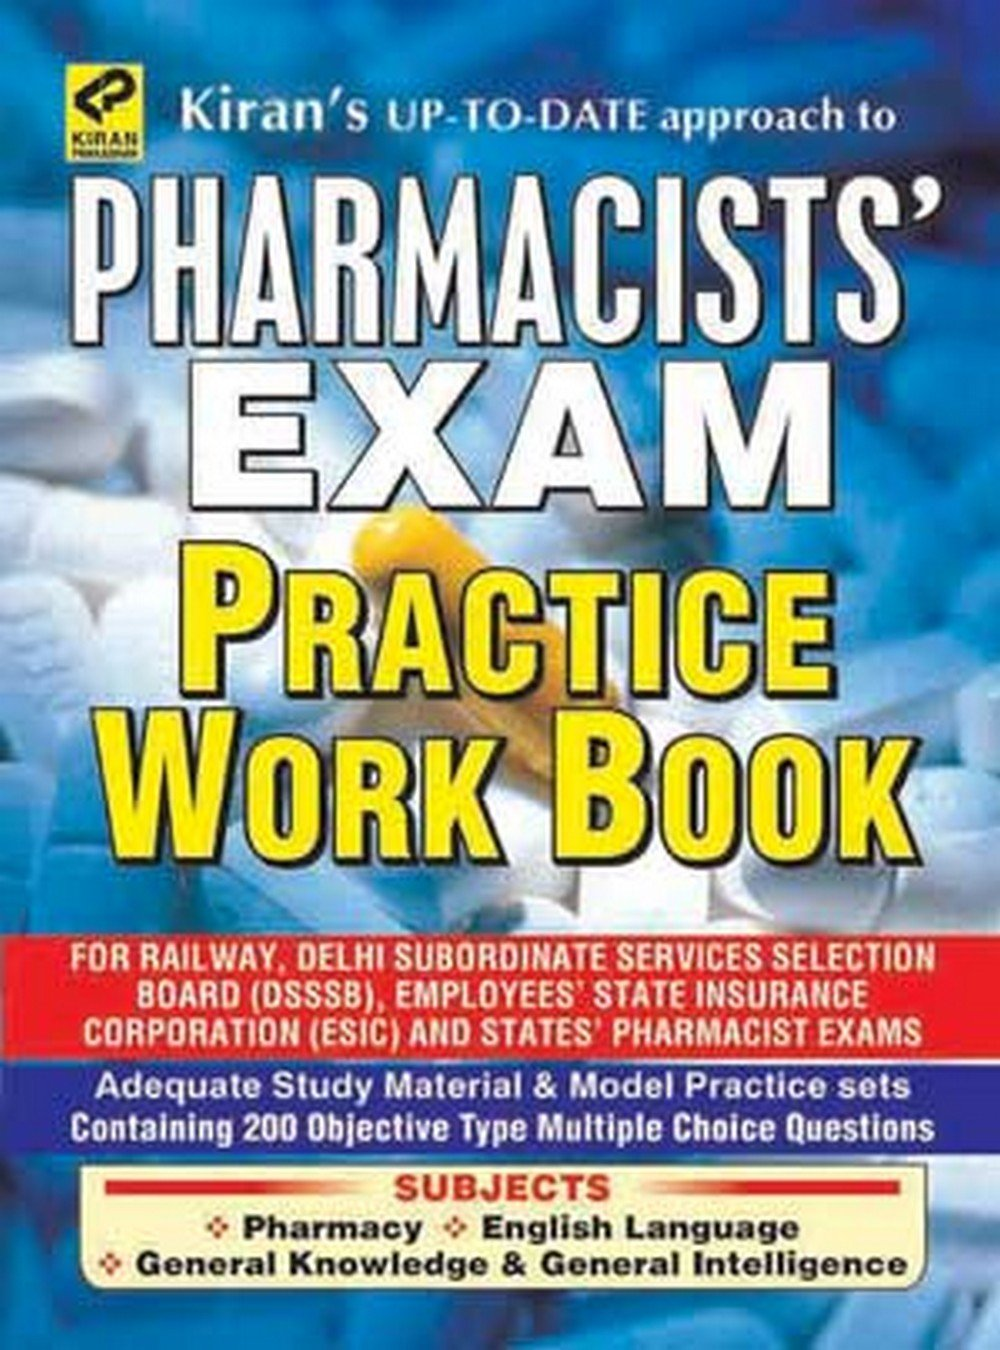 Hospital Pharmacy Books Pdf